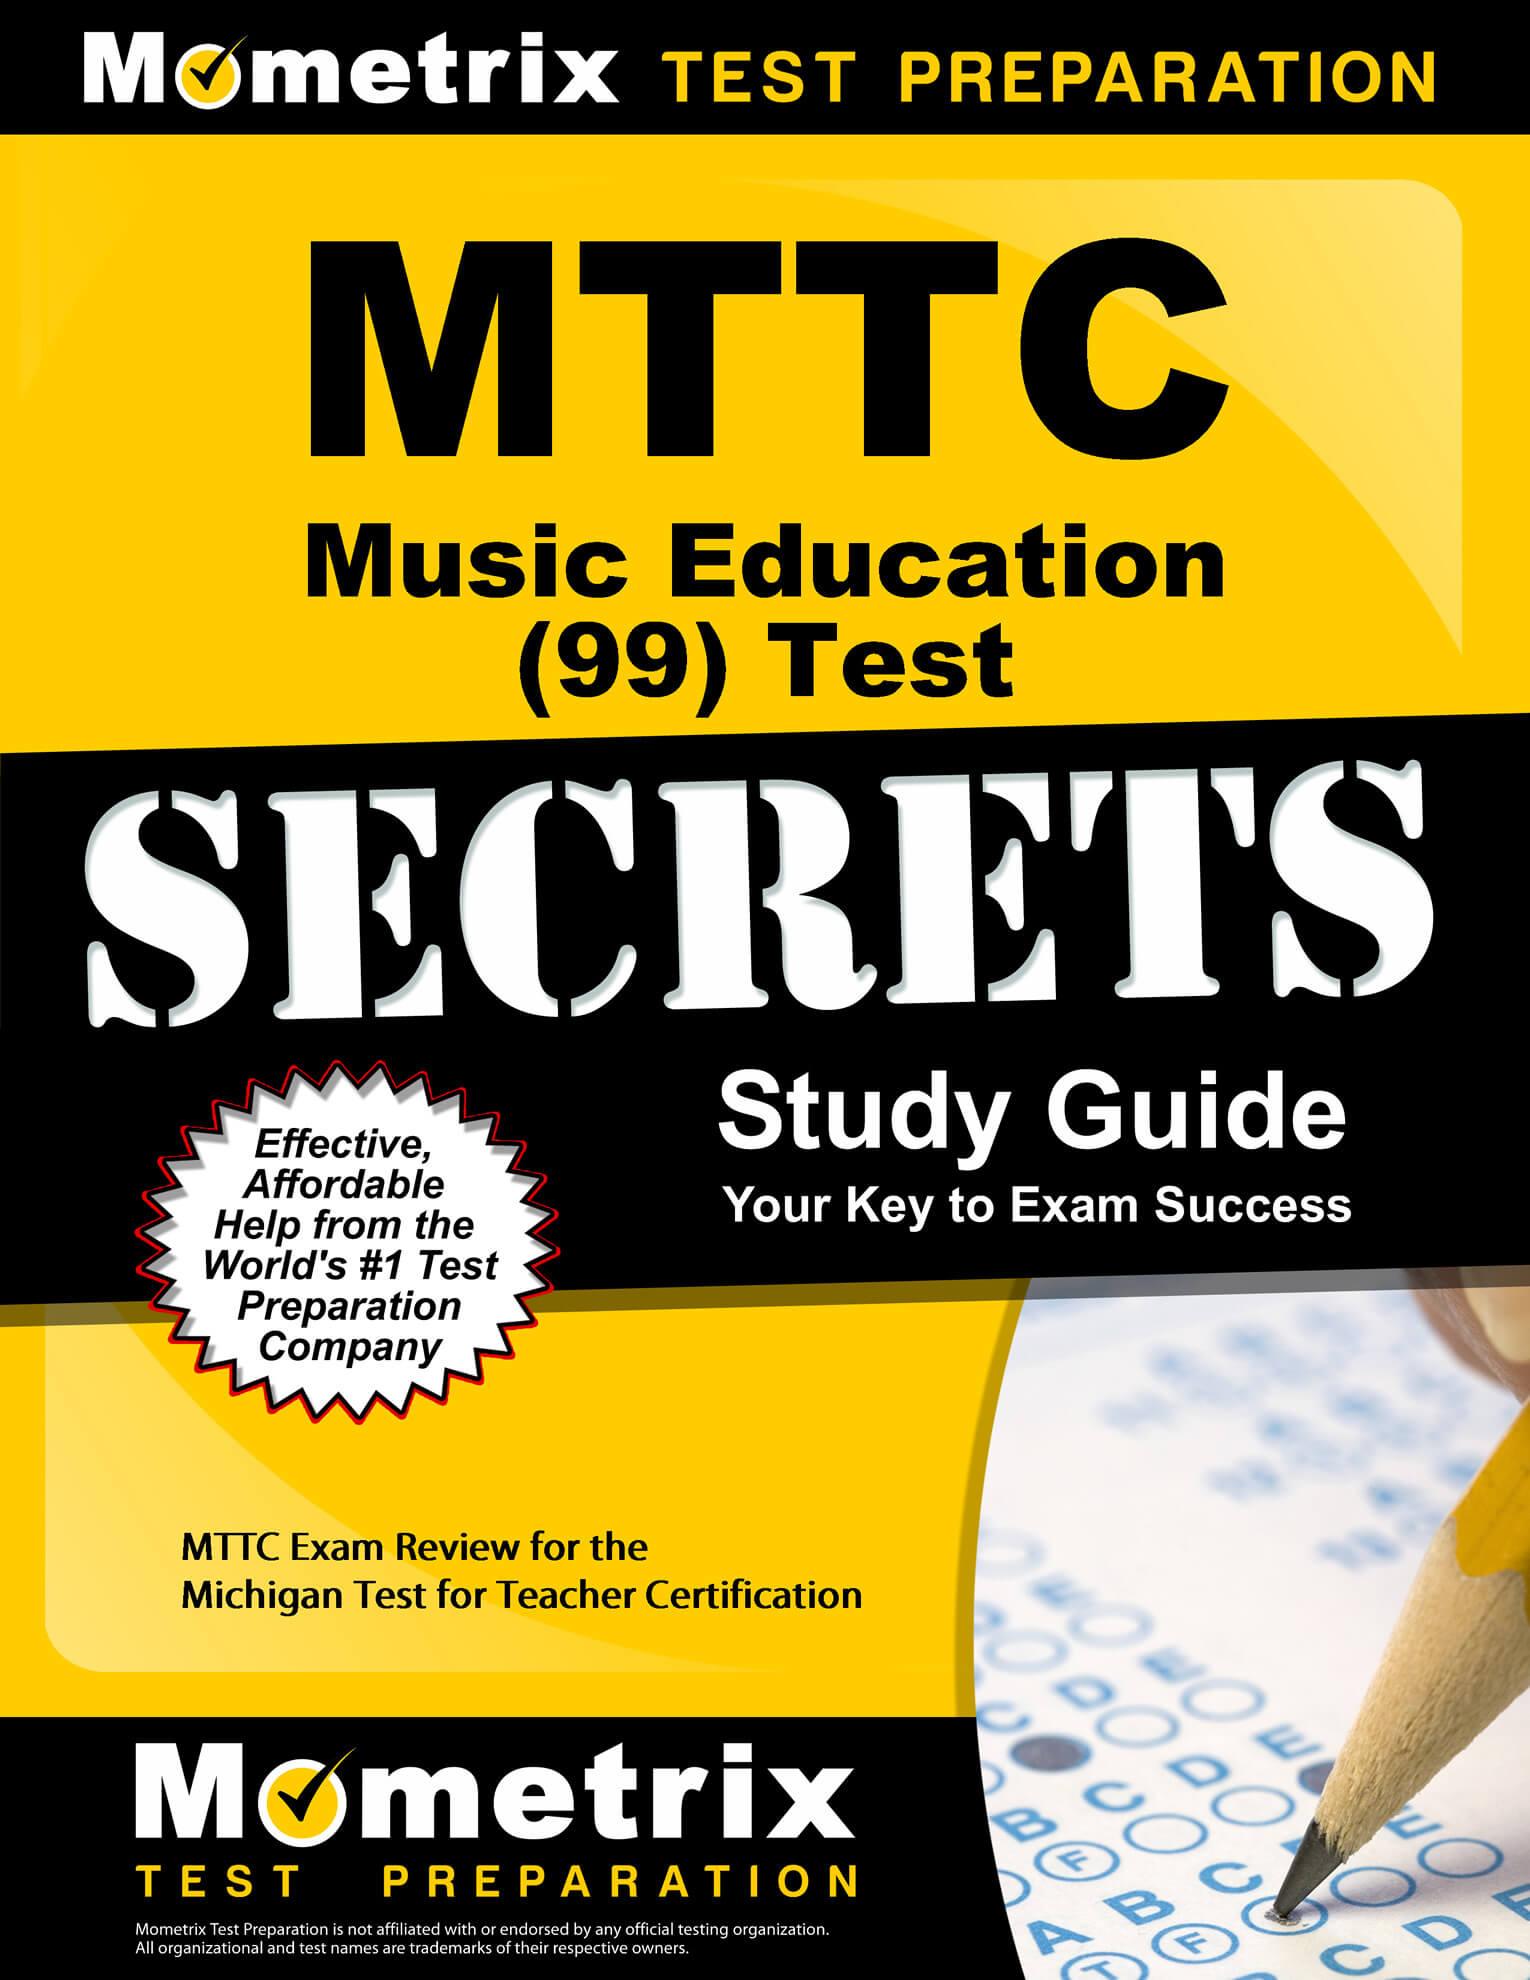 MTTC Music Education Study Guide